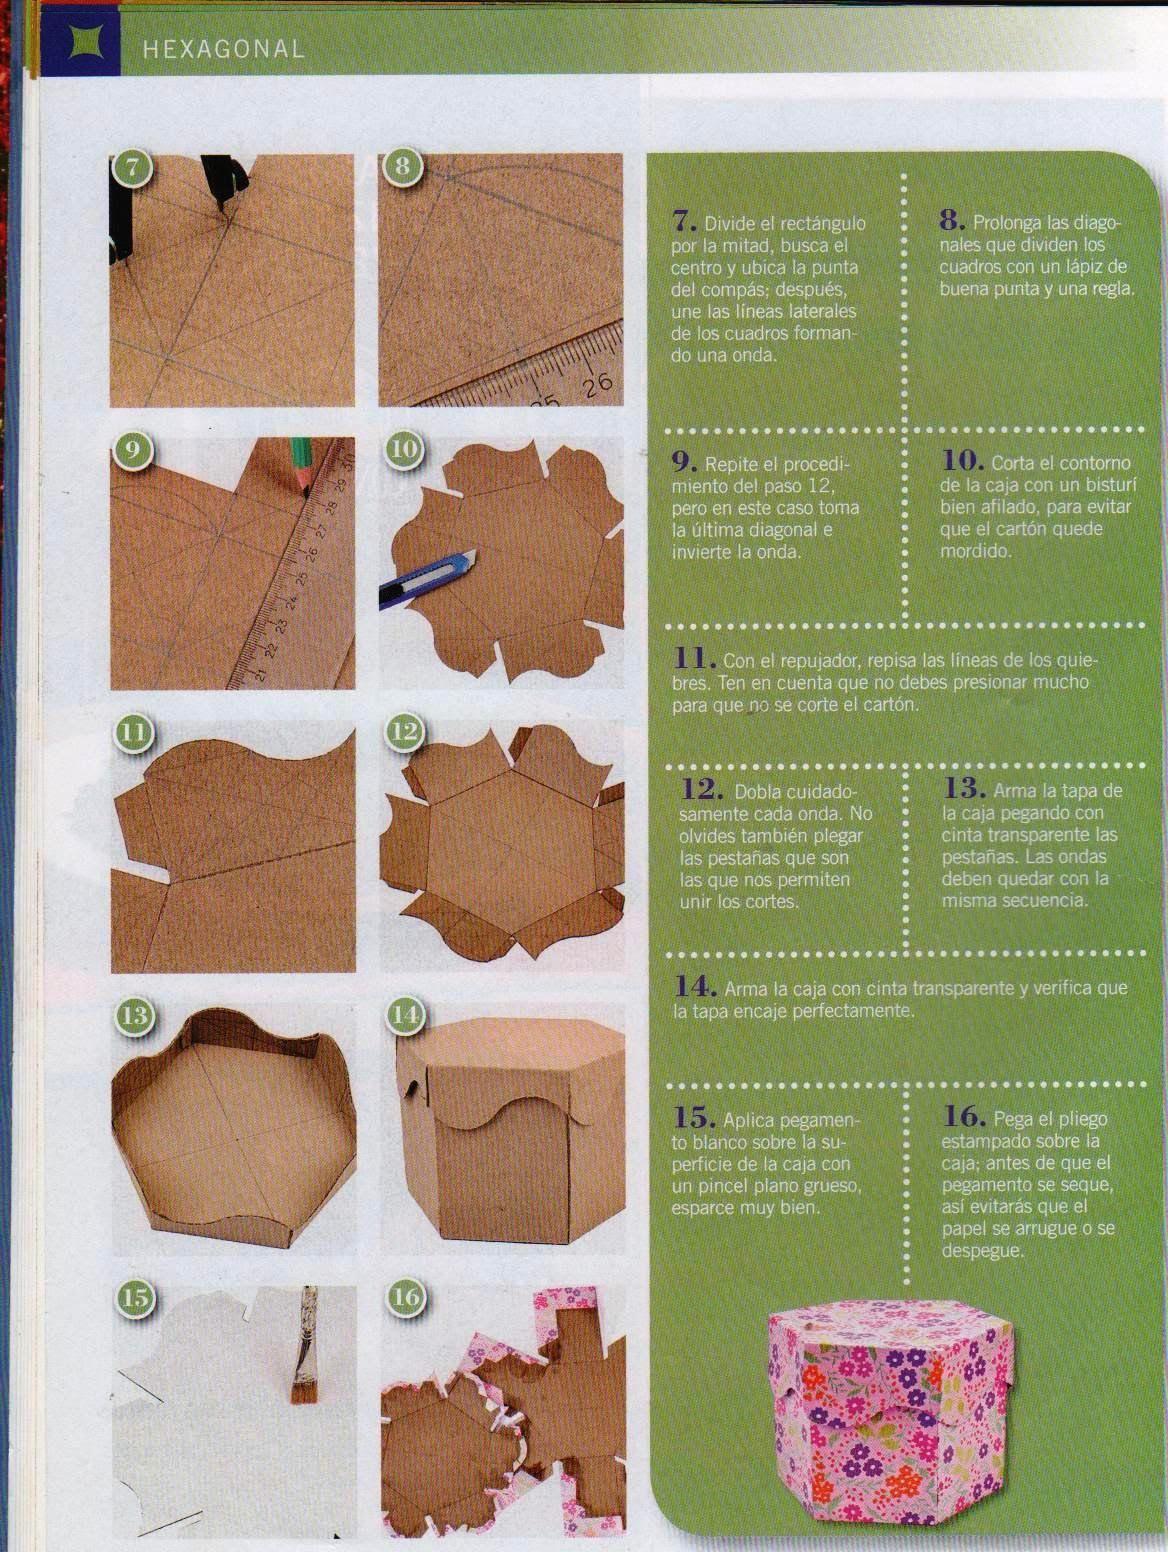 Como hacer tarjetas paso a paso | detalles | Pinterest | Como hacer ...